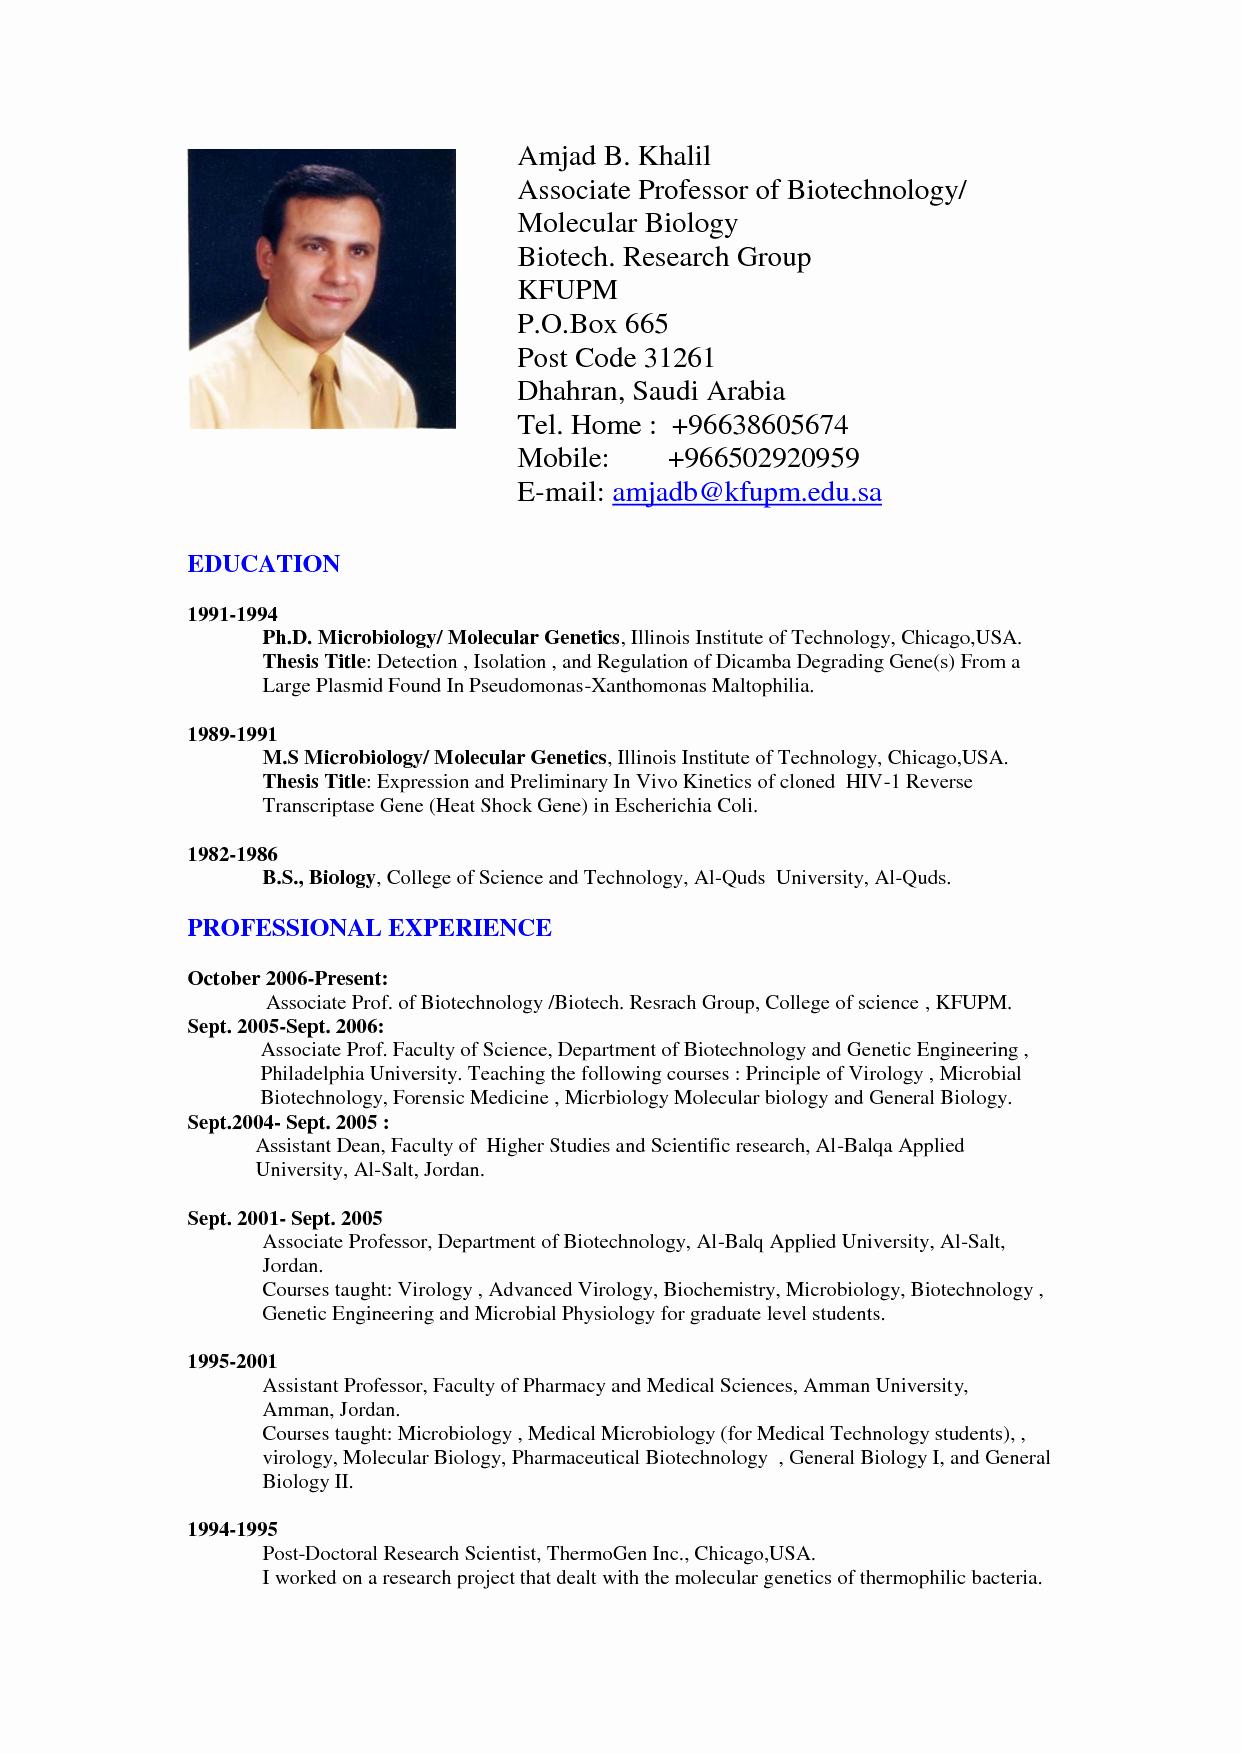 Sample Of Curriculum Vitae format Beautiful Professional Resume format Doc